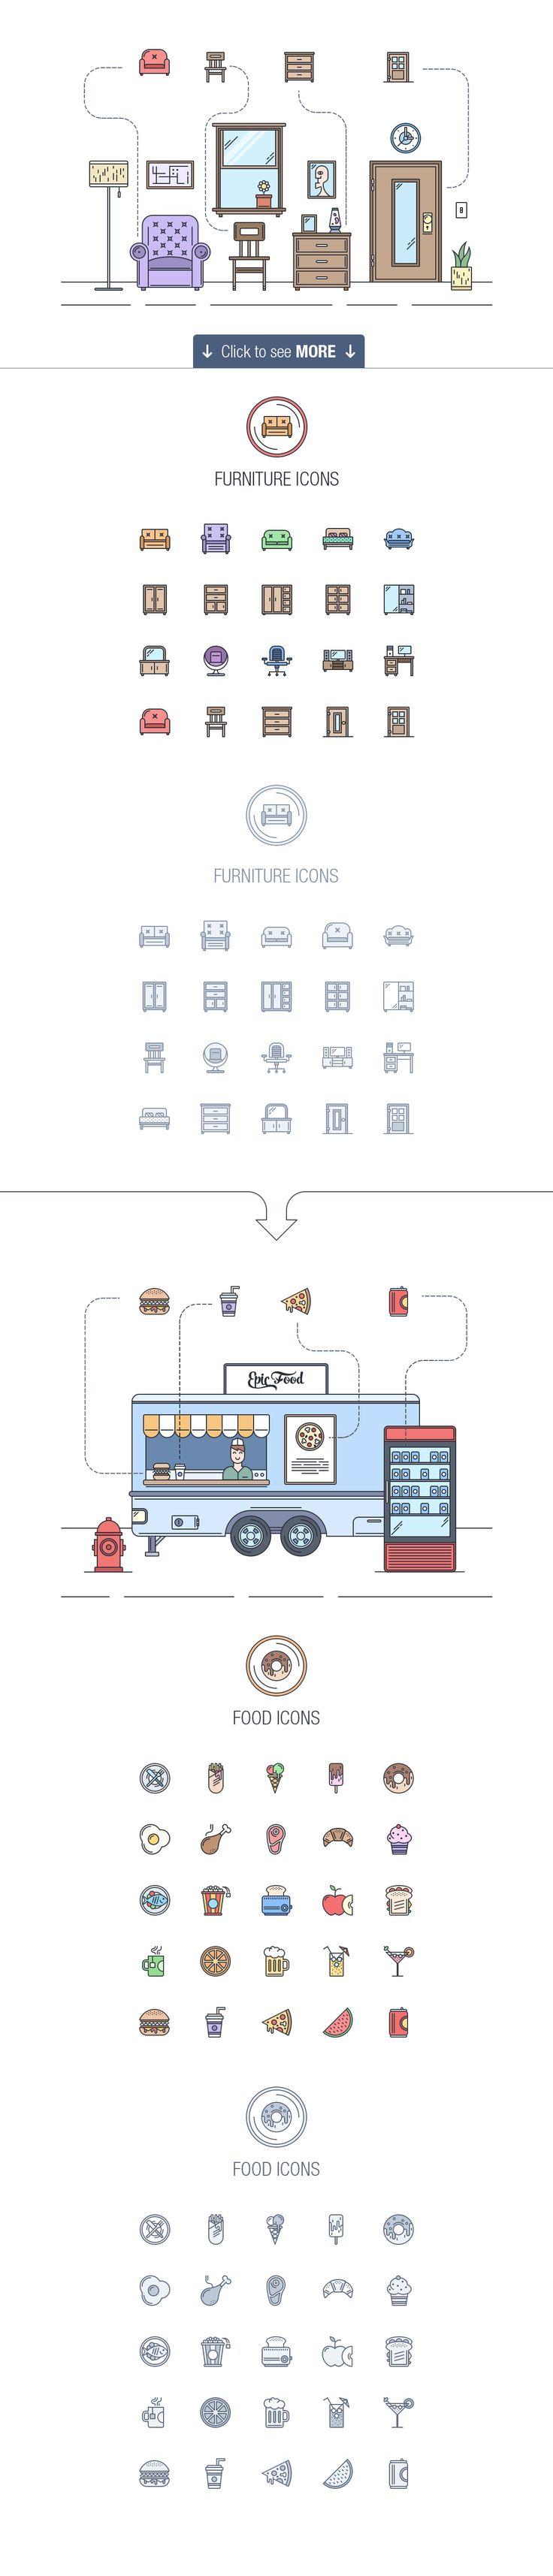 Epic landing icons + ILLUSTRATIONS by EpicShop on Creative Market